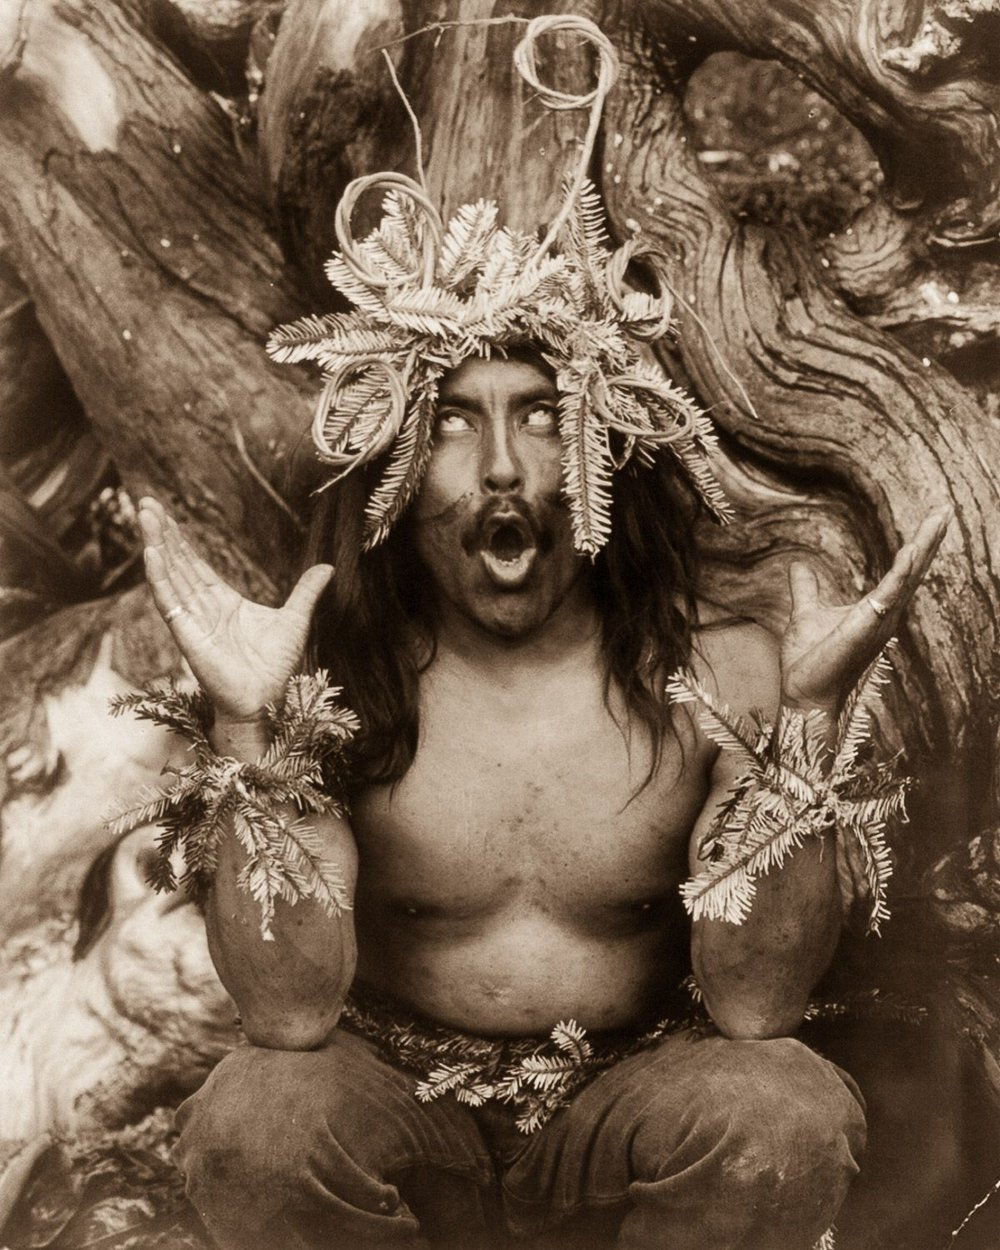 A Kwakiutl shaman performs a religious ritual,  1914.  ©EDWARD CURTIS/LIBRARY OF CONGRESS